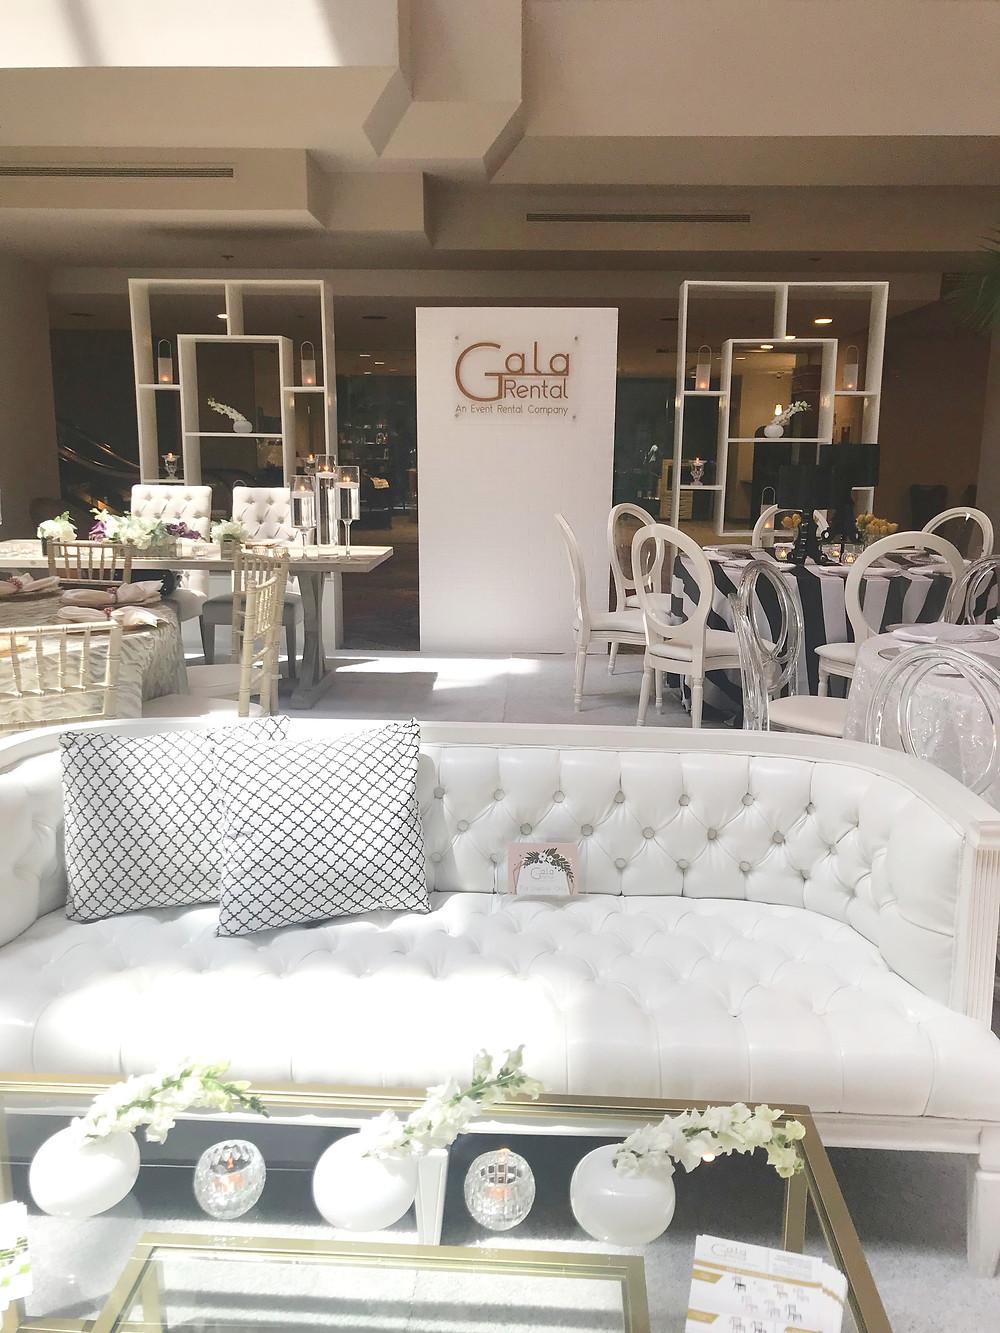 Gala Rental at Orlando Florida wedding expo.